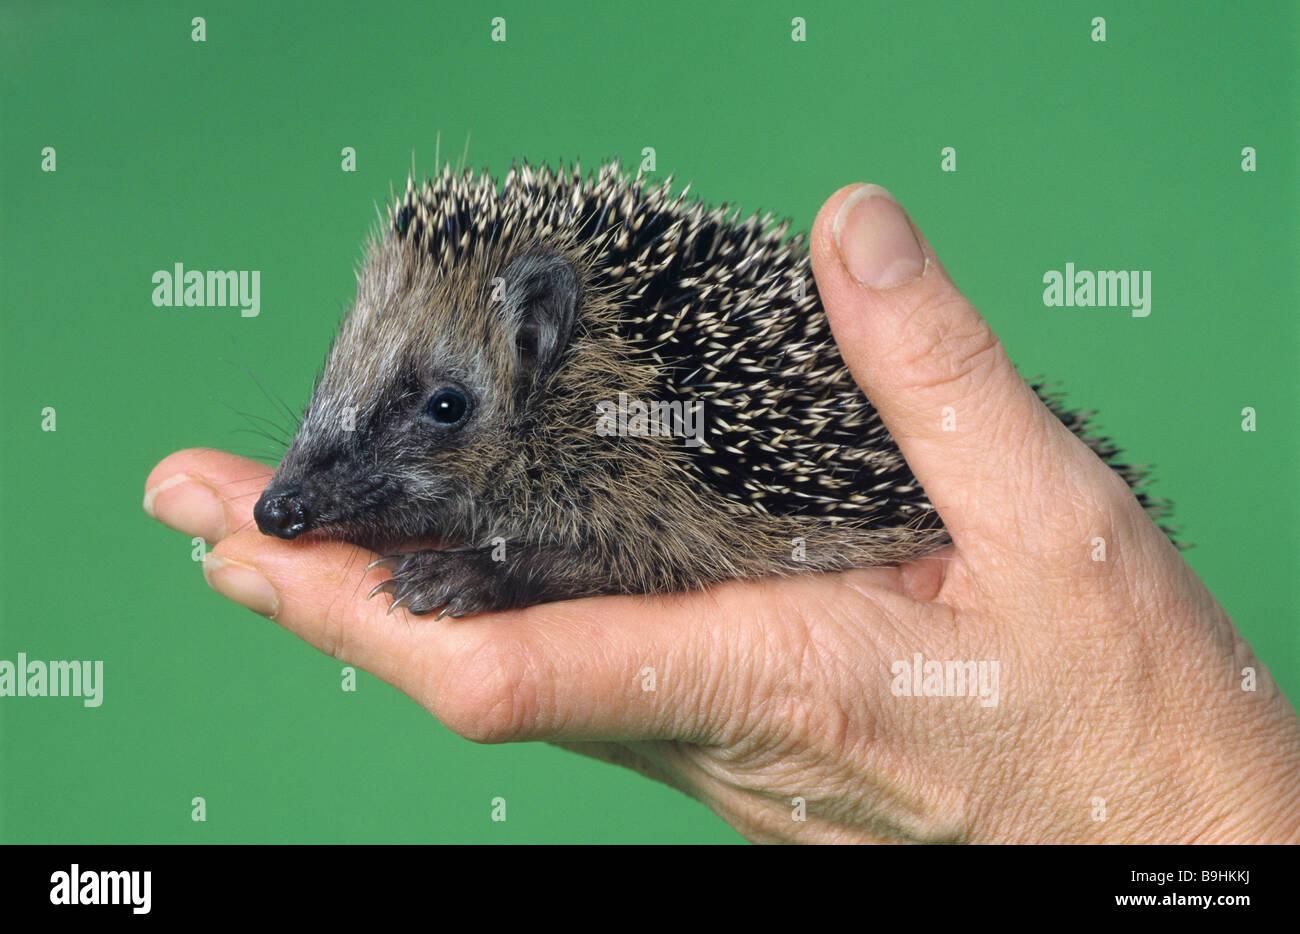 West European Hedgehog (Erinaceus europaeus) on a hand - Stock Image